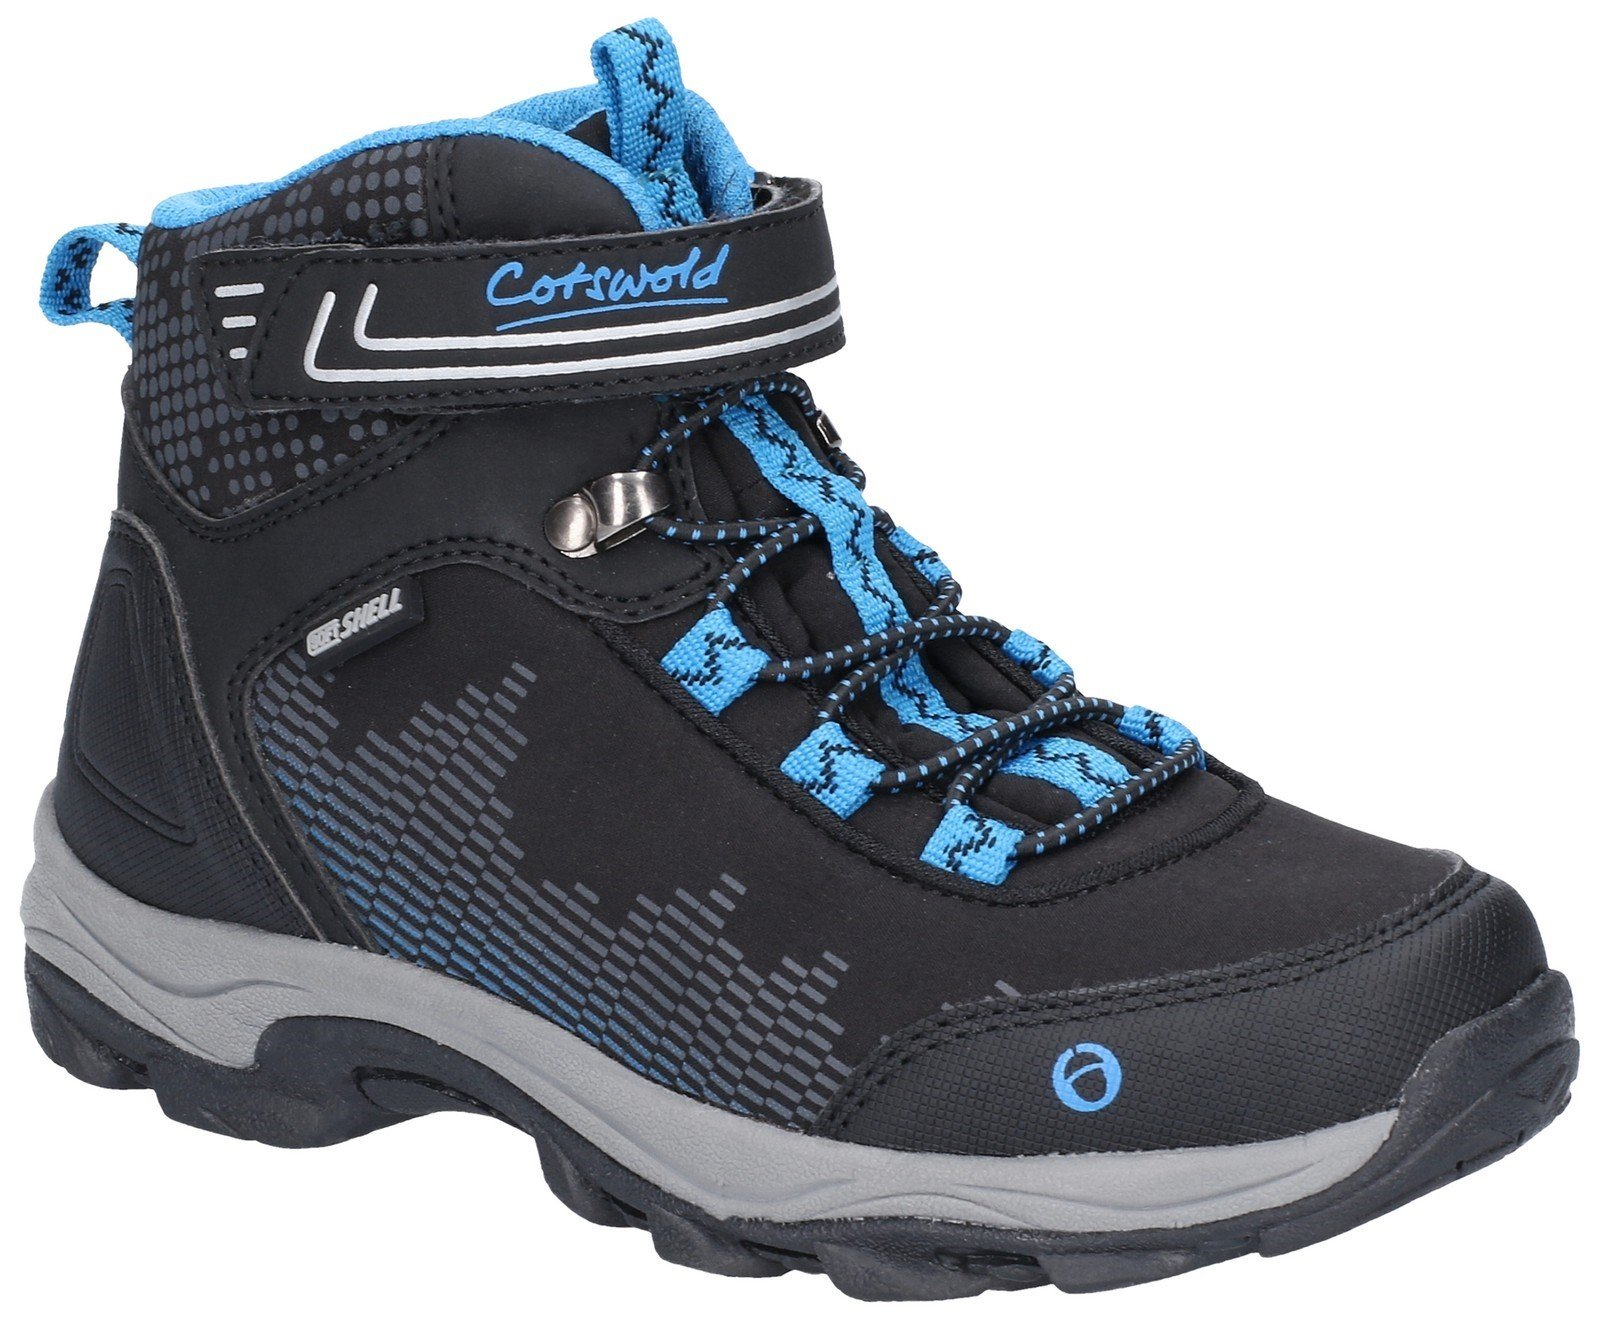 Cotswold Kids Ducklington Hiking Waterproof Boot Multicolor 28252 - Black/Blue 8